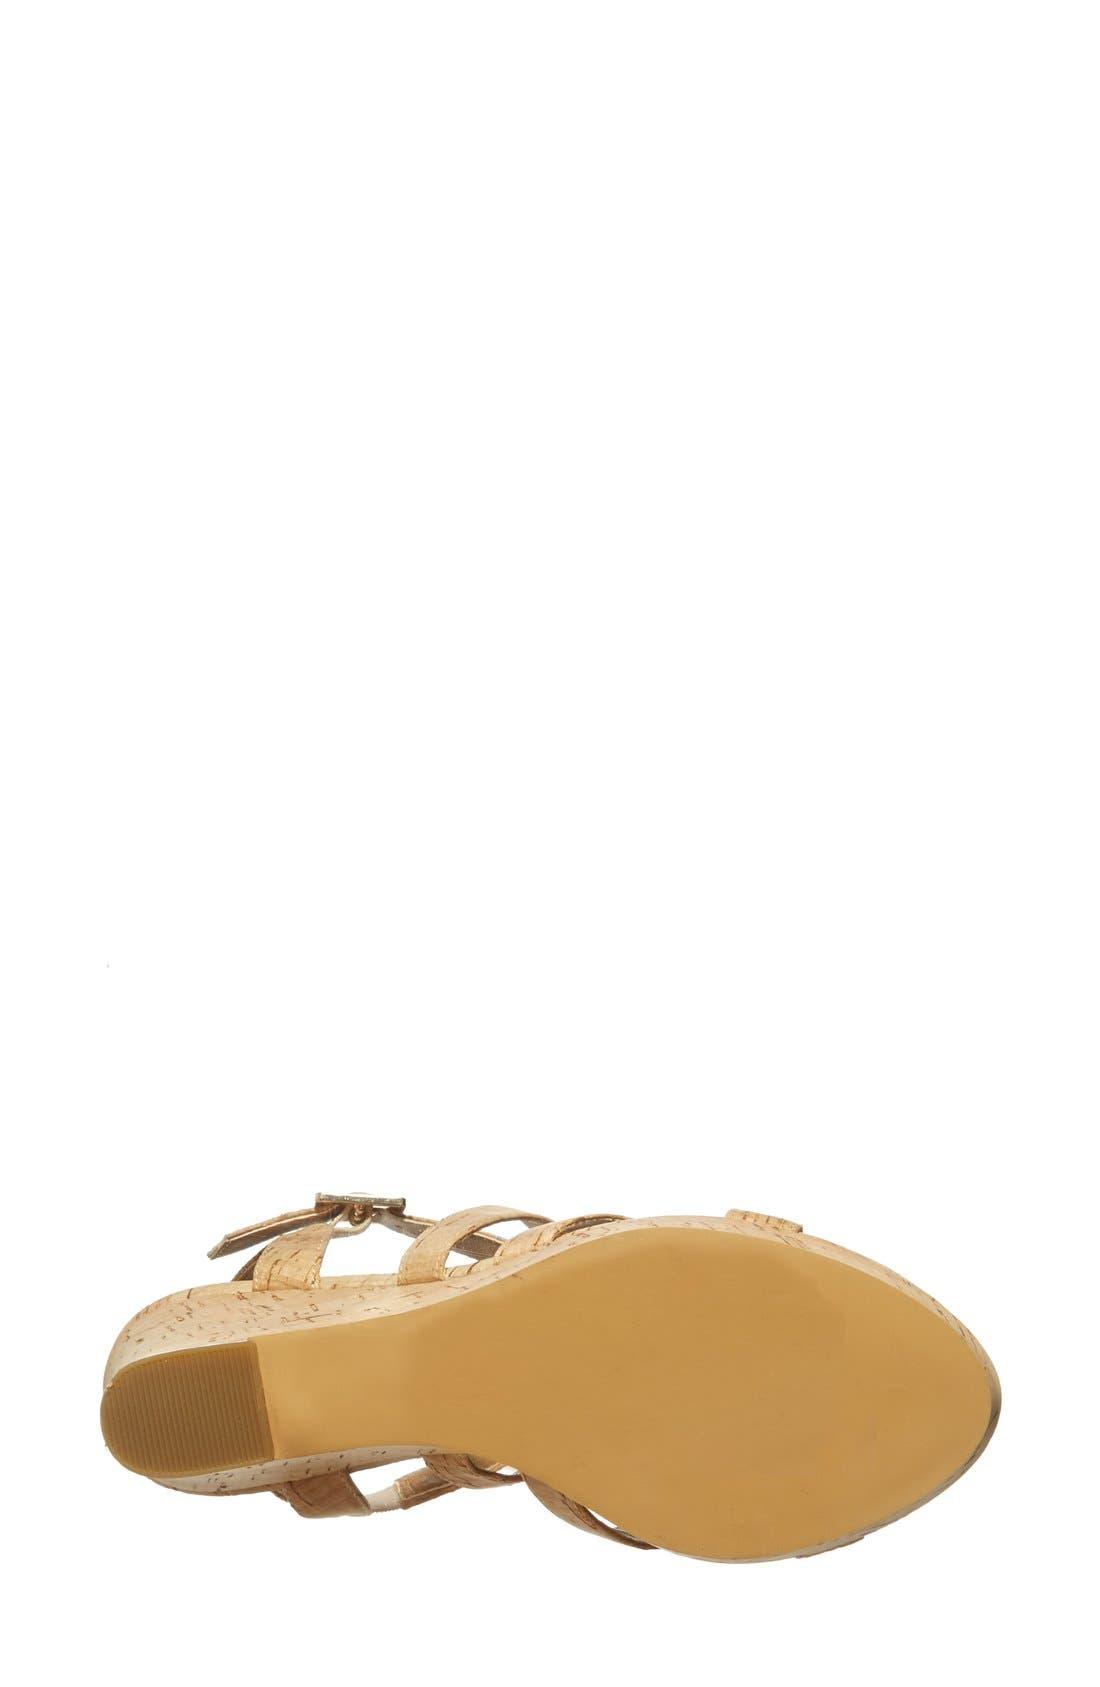 'Summers' Wedge Sandal,                             Alternate thumbnail 31, color,